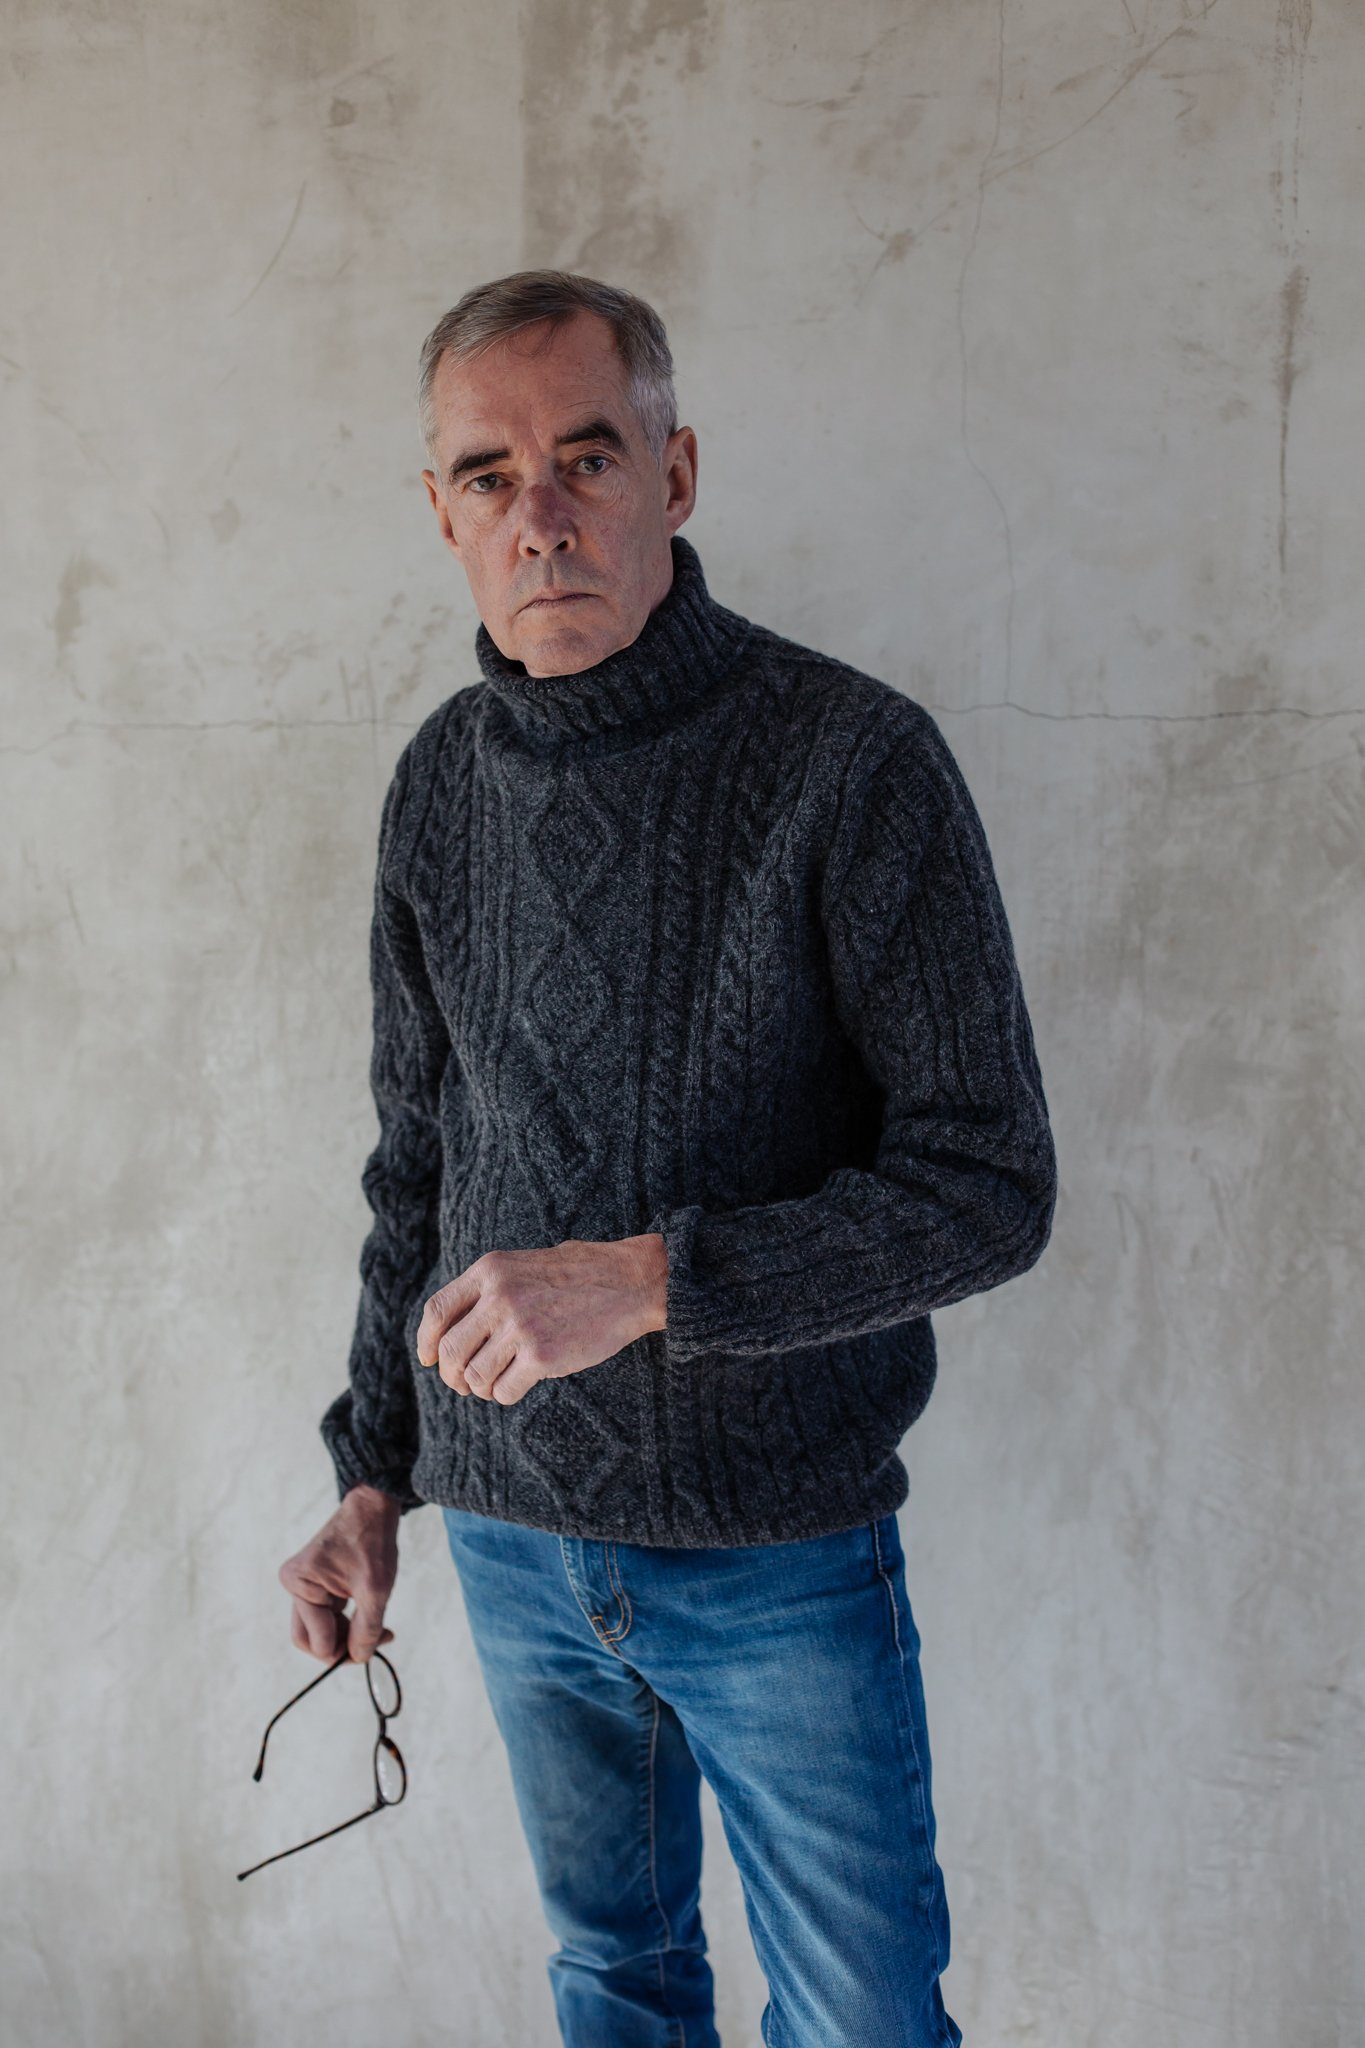 a95da2eb9896b4 Trouva: Oxford Grey Mens Lambswool Cable Knit Jumper